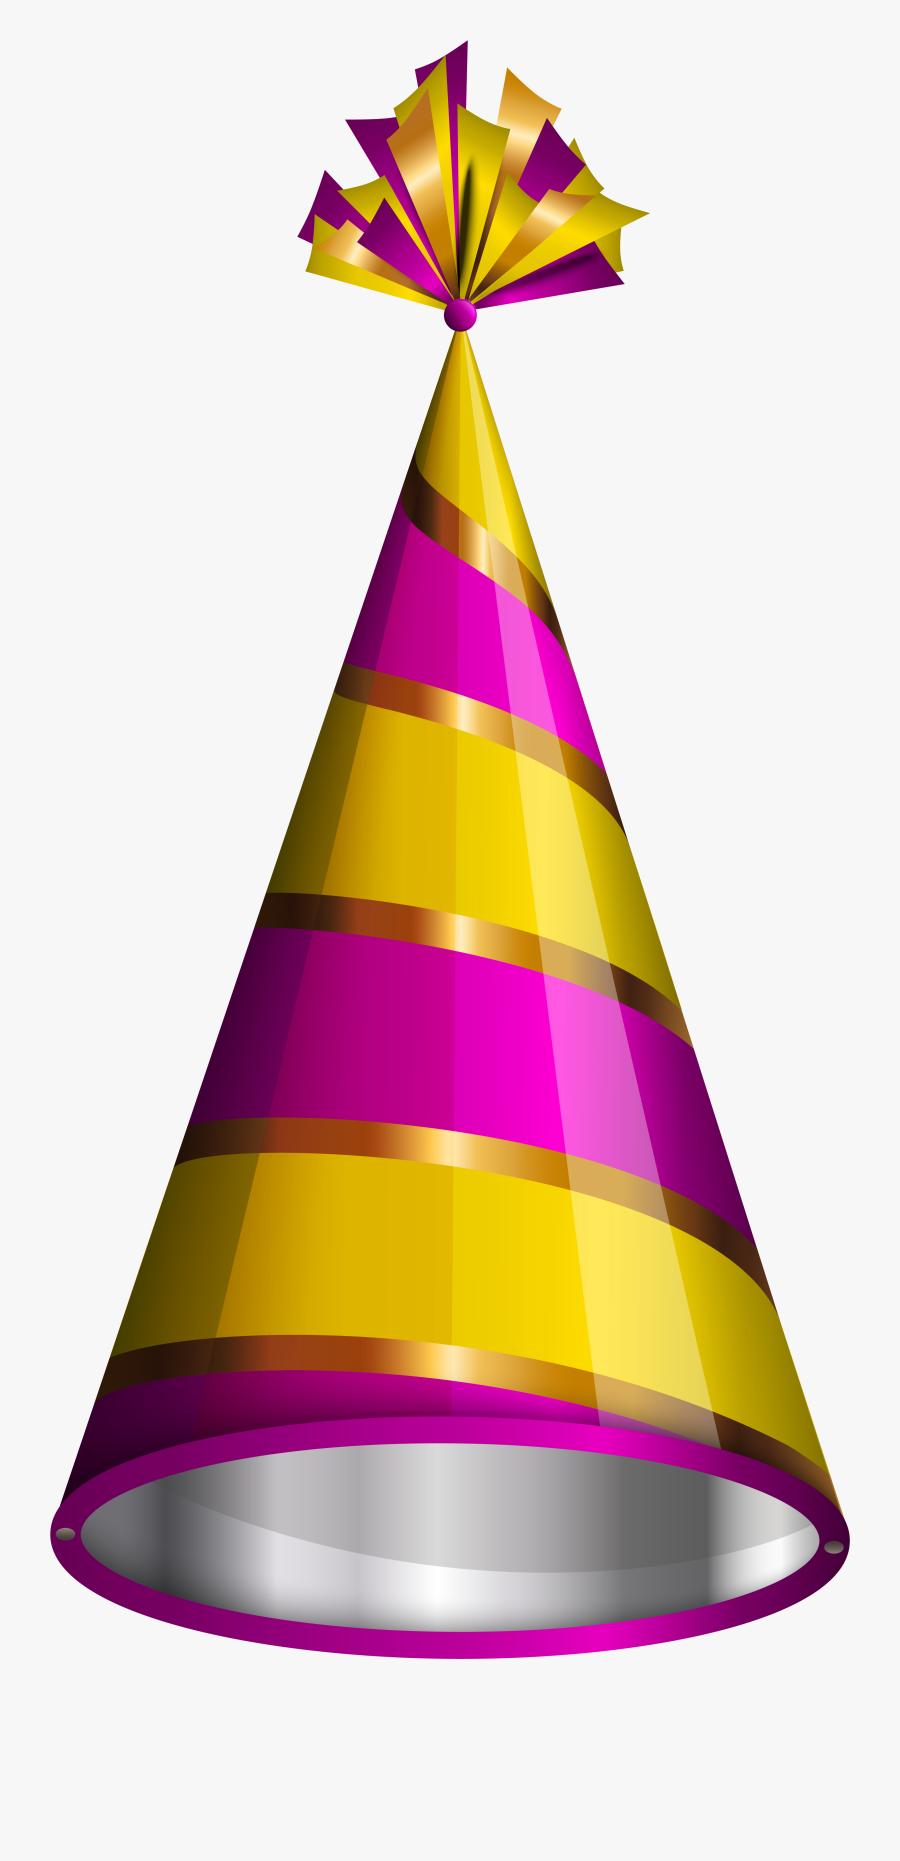 Birthday Hat Birthday Party Hat Clipart Image - Birthday Hat Png Transparent, Transparent Clipart